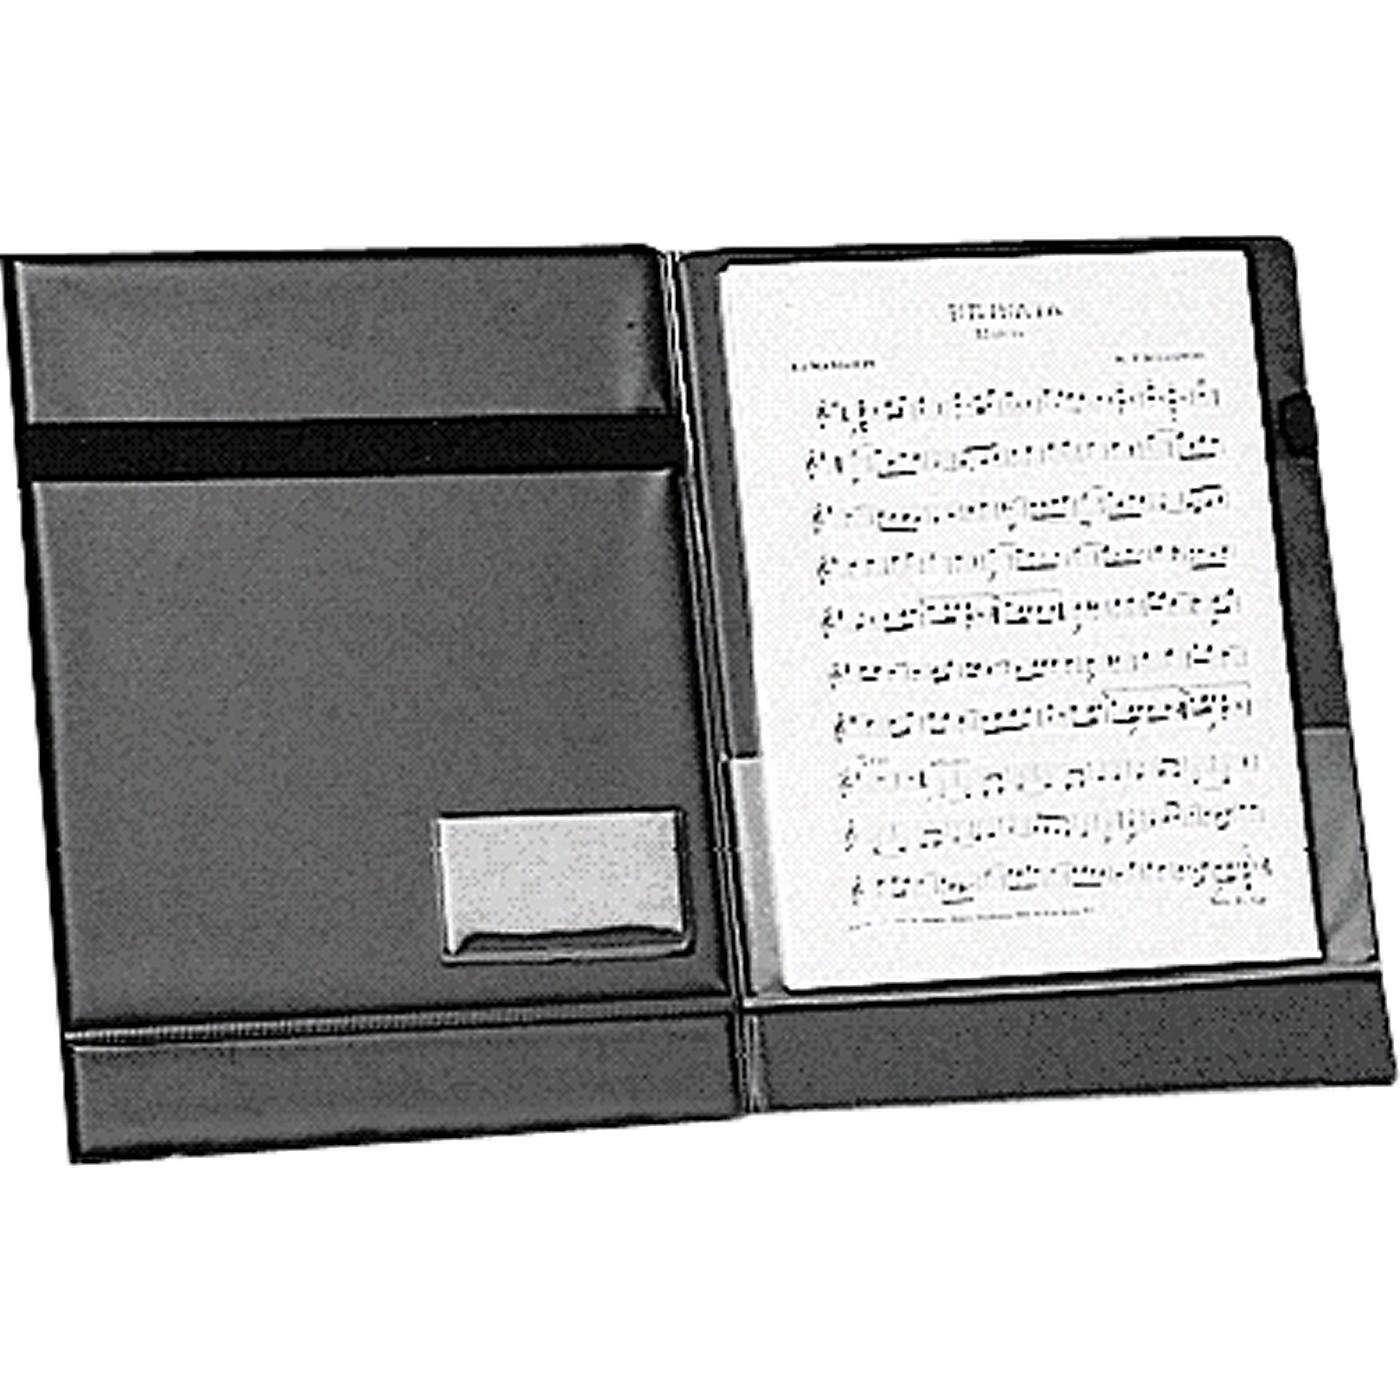 Manhasset 1650 Fourscore Folder thumbnail